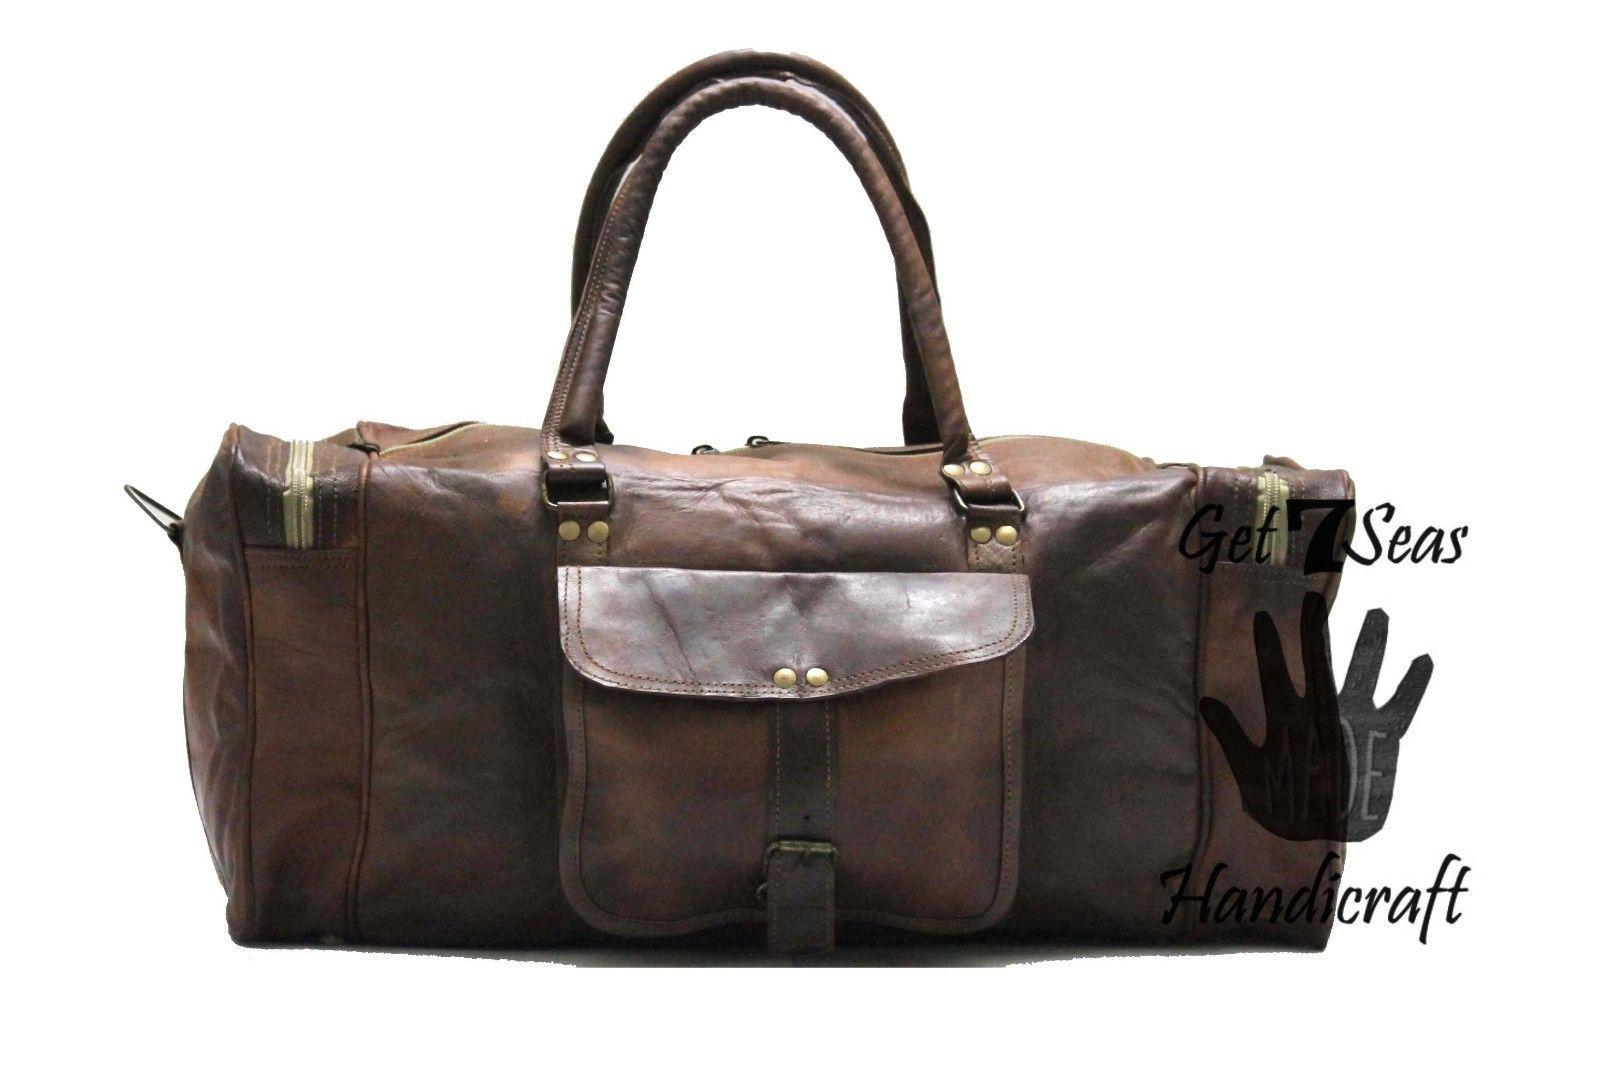 Weekender bag men's leather travel women overnight bag luggage sport men bags - $98.96